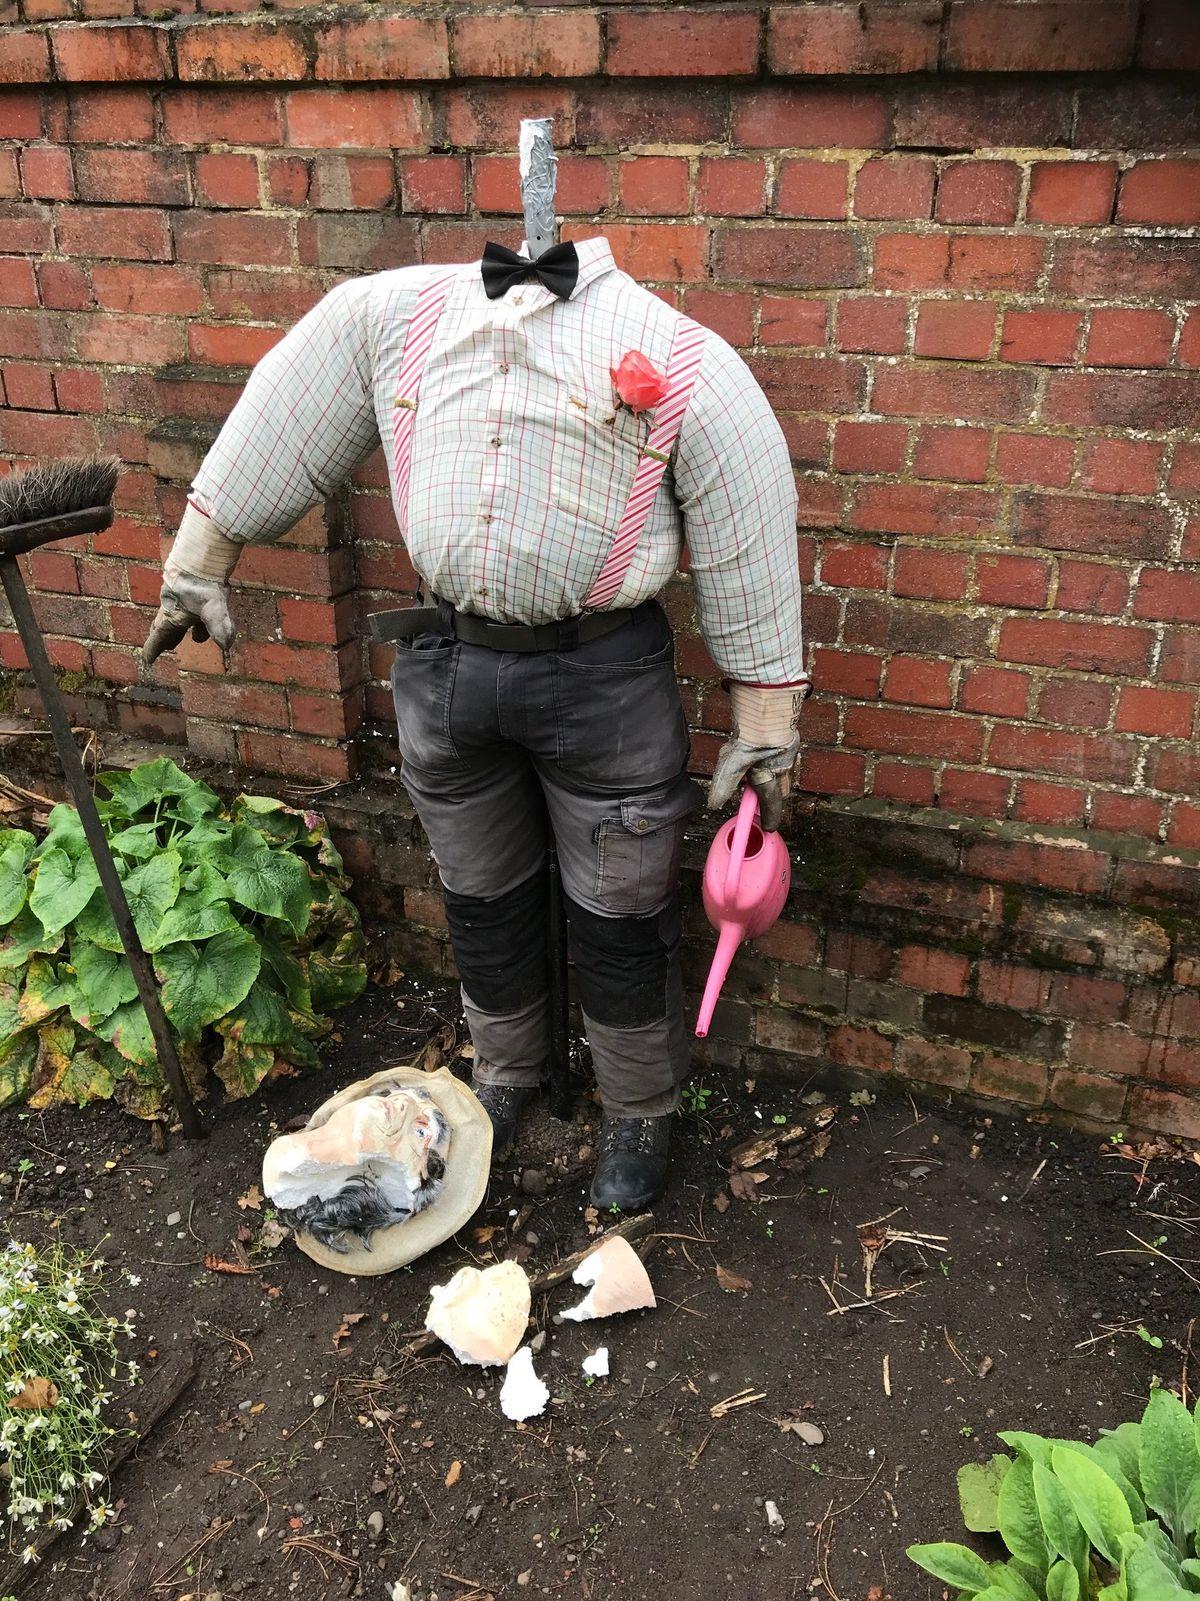 The Bridgnorth Scarecrow